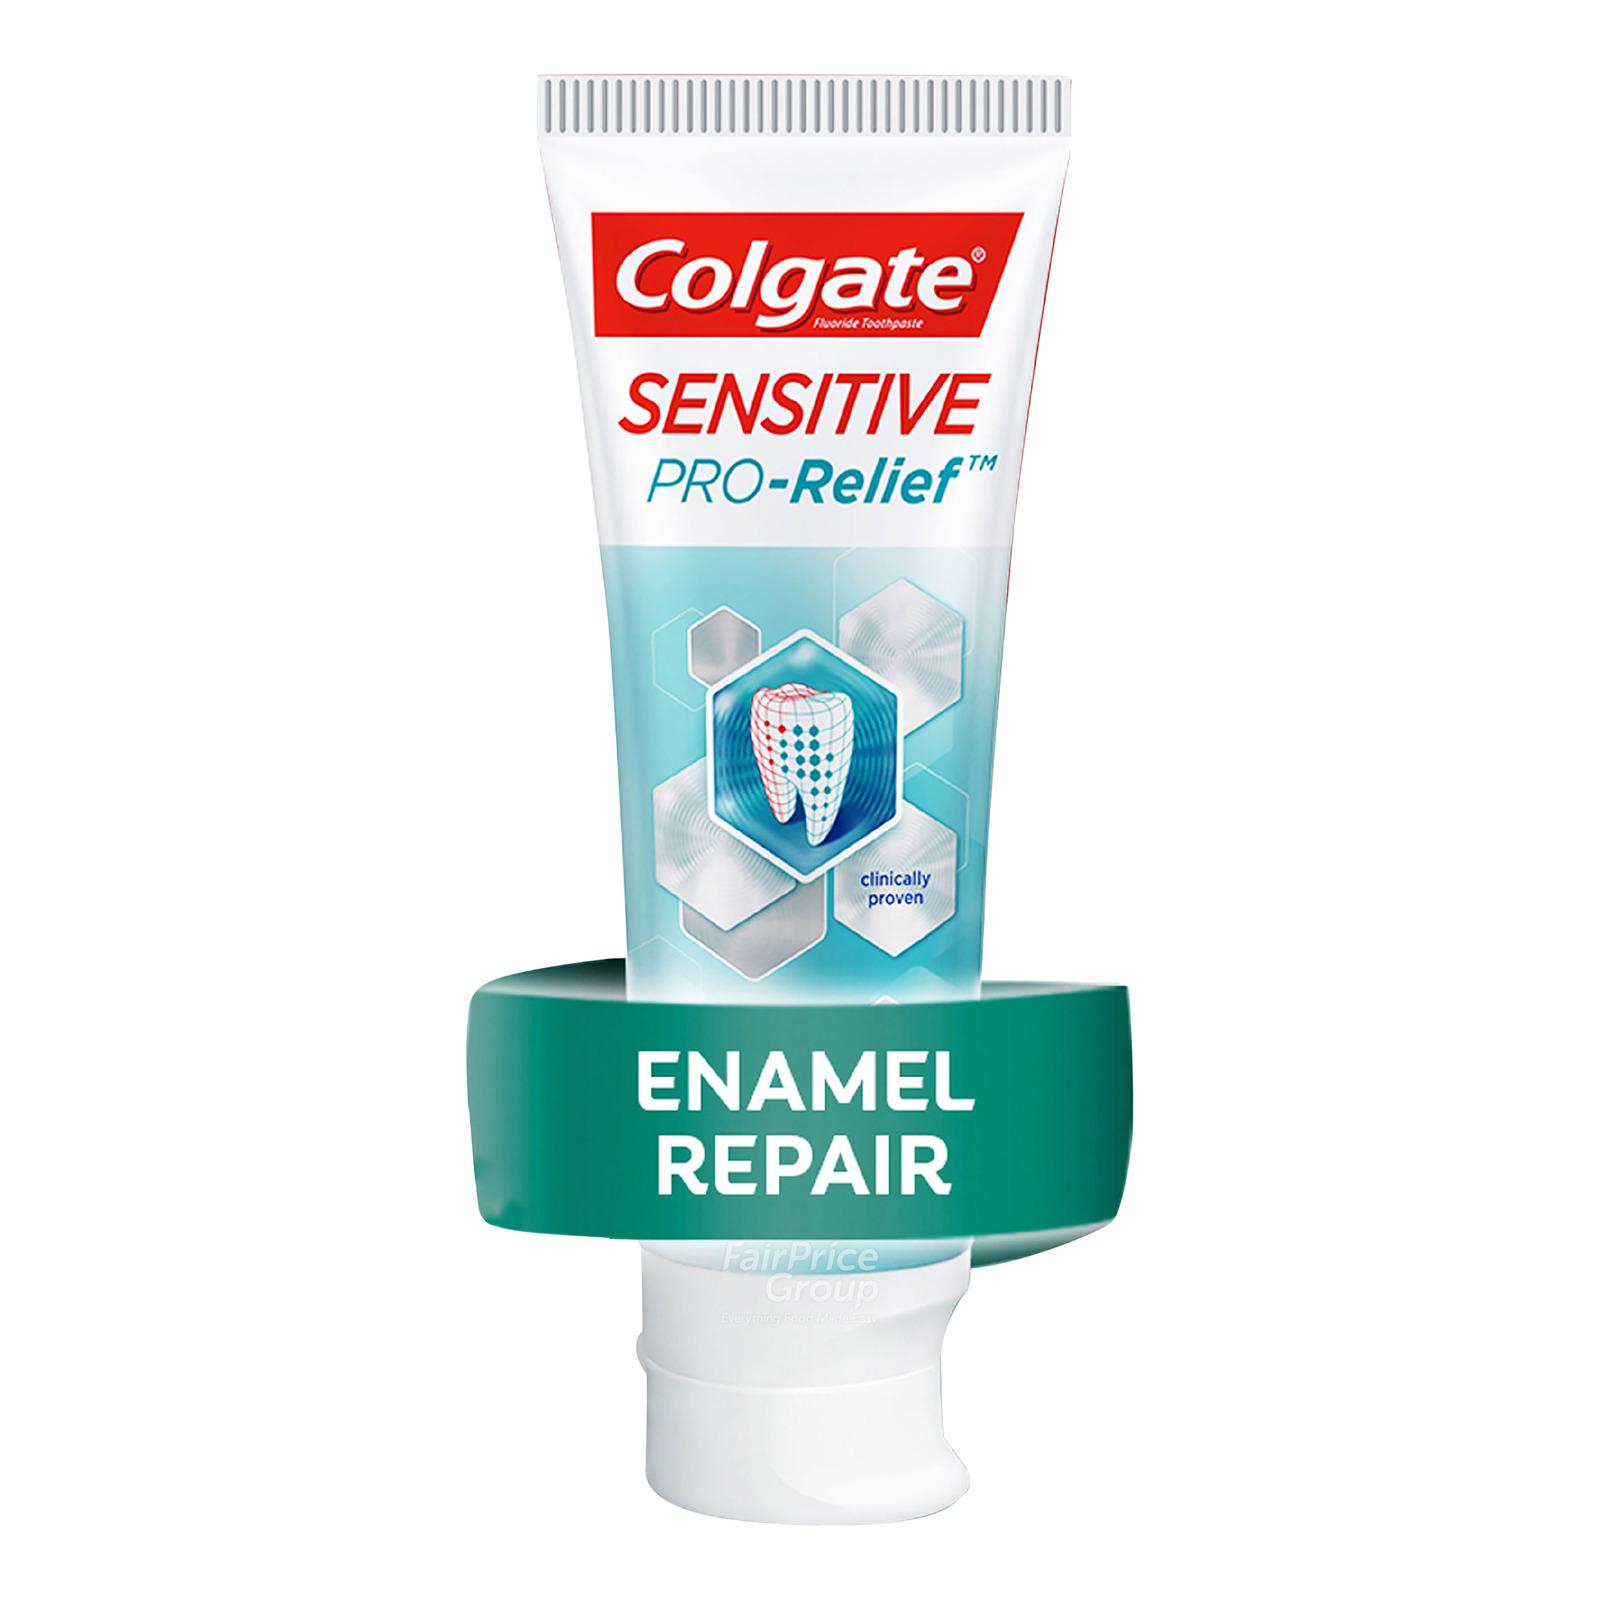 COLGATE Toothpaste Sensitive Pro.Relief - Enamel Repair 110g